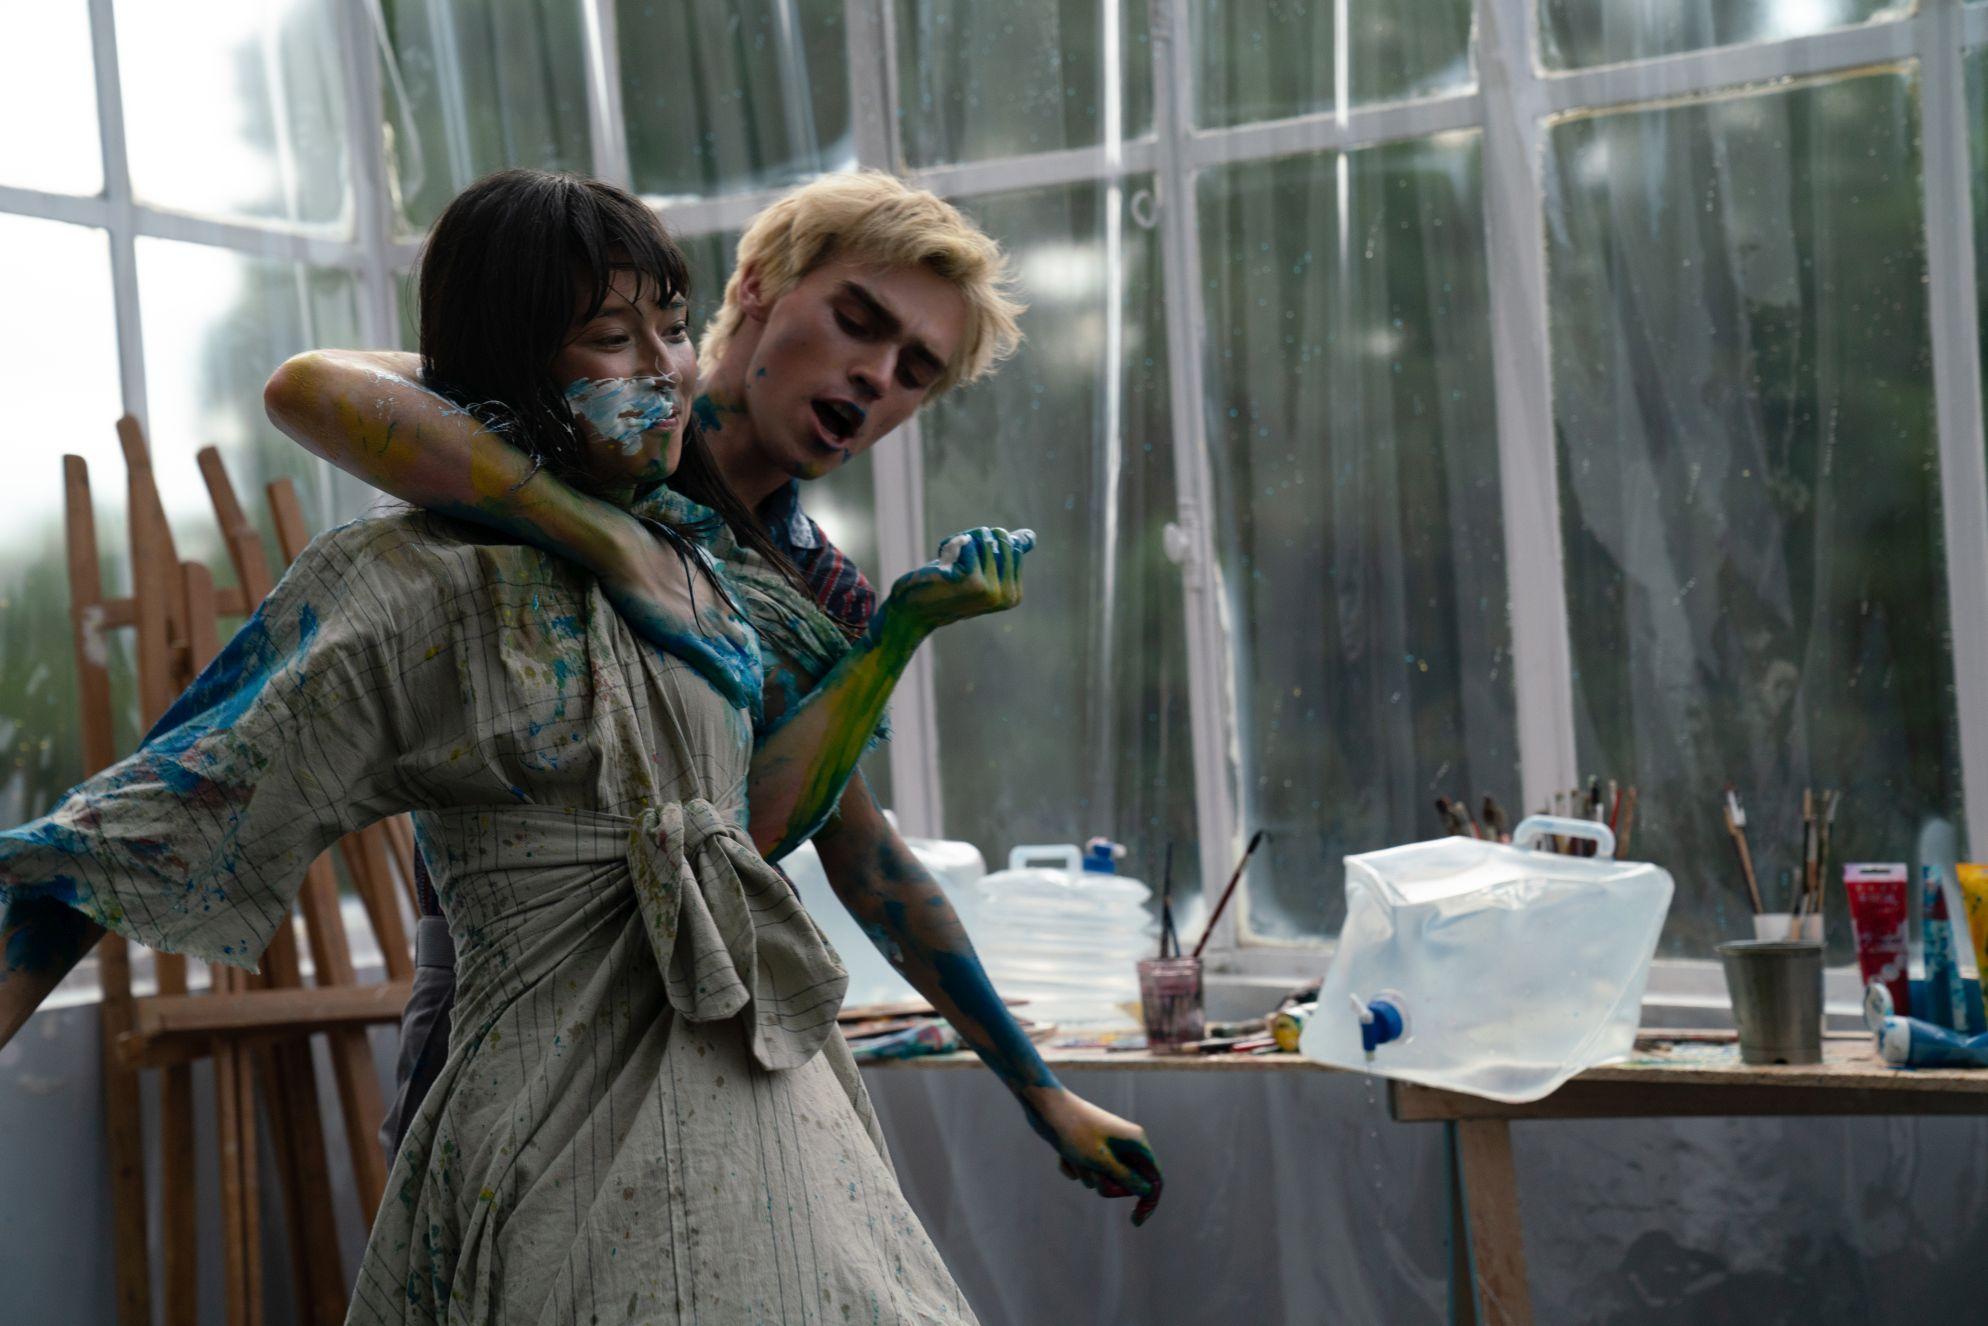 Osmosis: Lena Lapres e Manoel Dupont una scena della serie